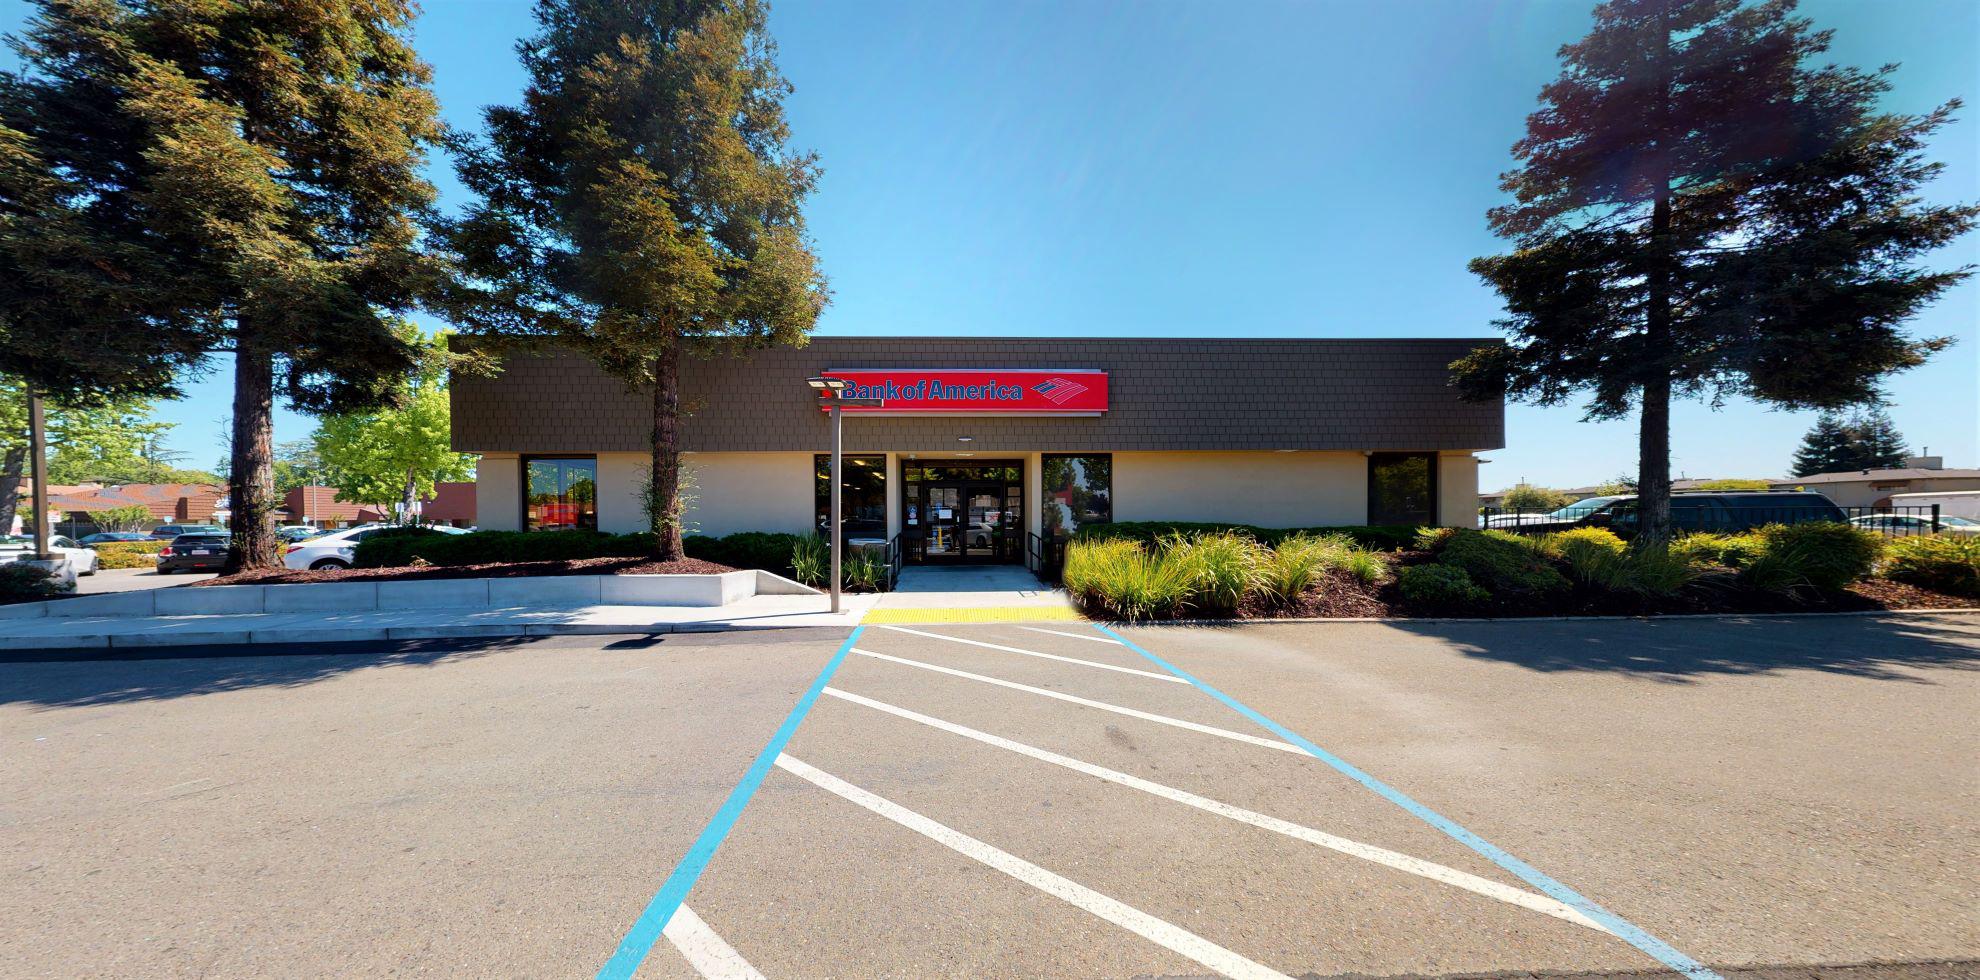 Bank of America financial center with drive-thru ATM | 1546 Saint Marks Plz, Stockton, CA 95207